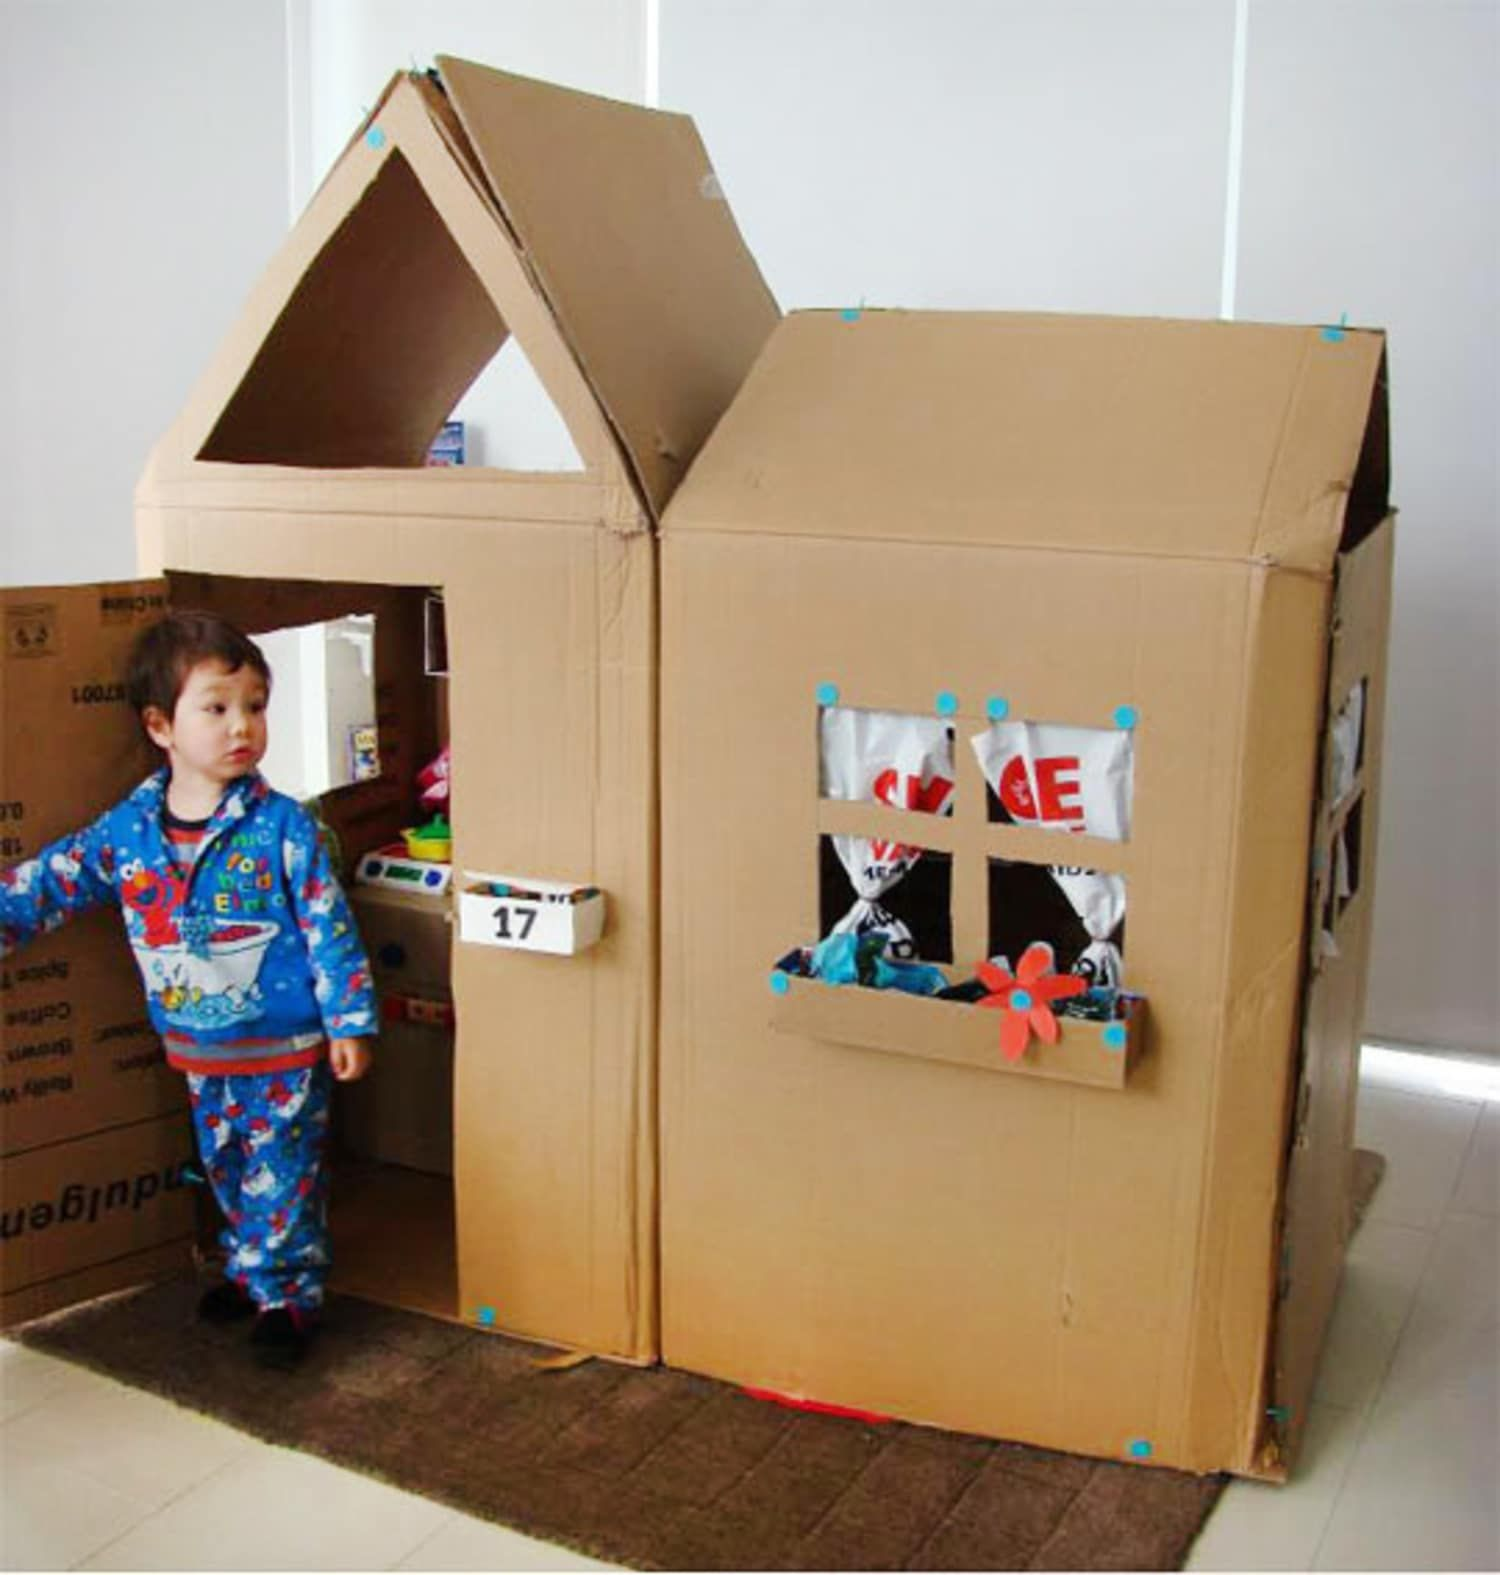 Inspiring DIY Cardboard Playhouse Cardboard playhouse